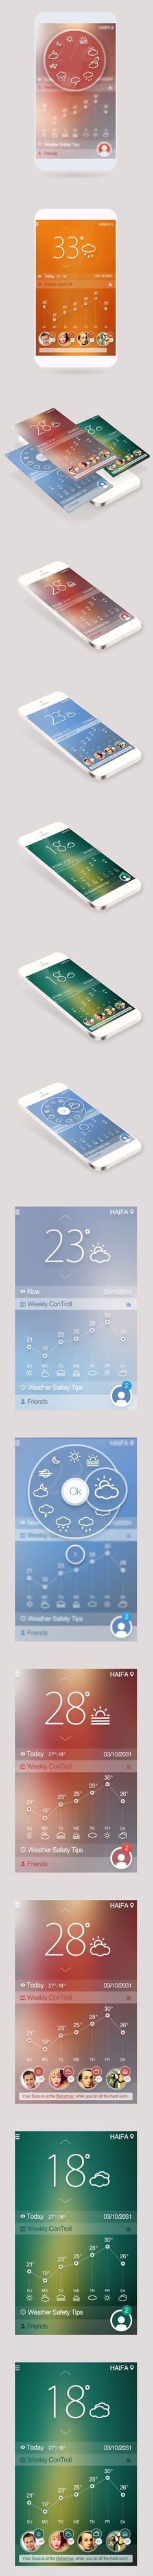 mobile interface w/social aspect Mobile Ui Design, App Ui Design, Design Responsive, Design Design, Gui Interface, User Interface Design, Wireframe, Apps, Digital Communication